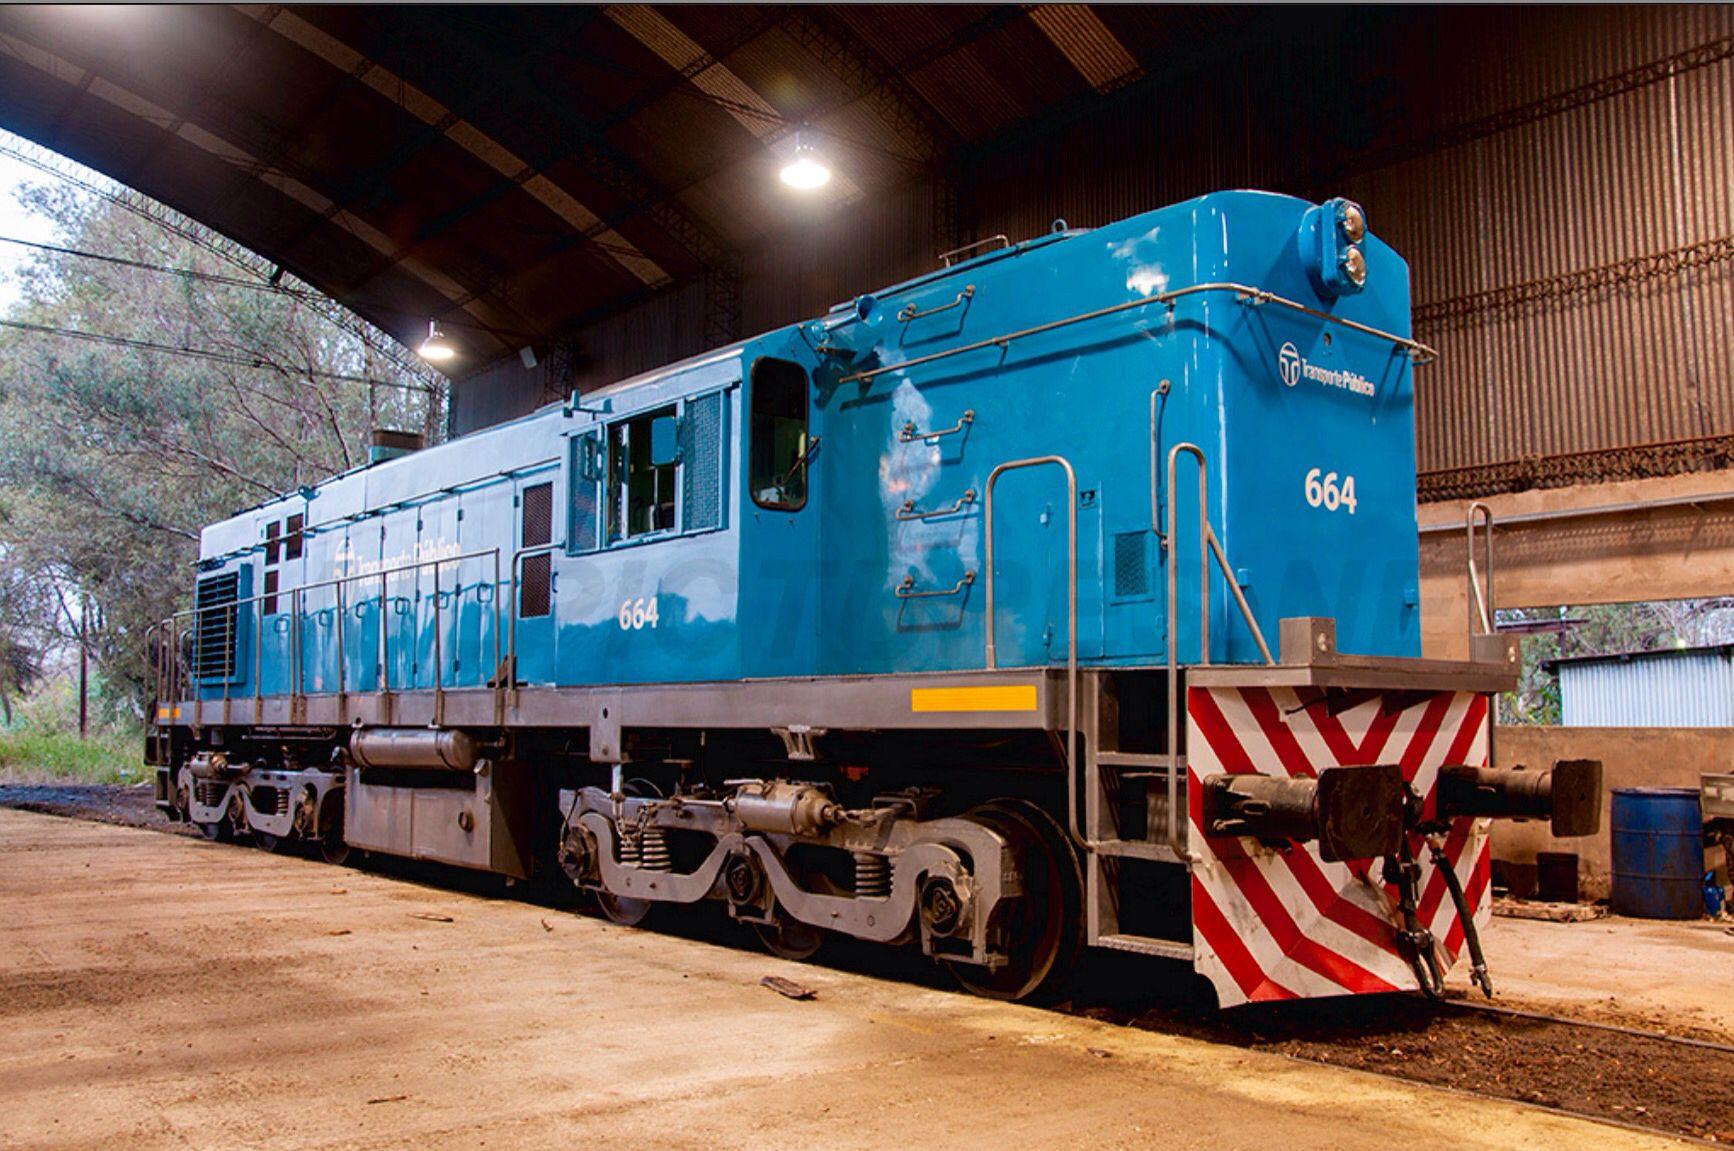 Trenes Argentinos,   Locomotive: ALCo DL 535 T, Location: Buenos Aires, Argentina, Locomotive #: D664